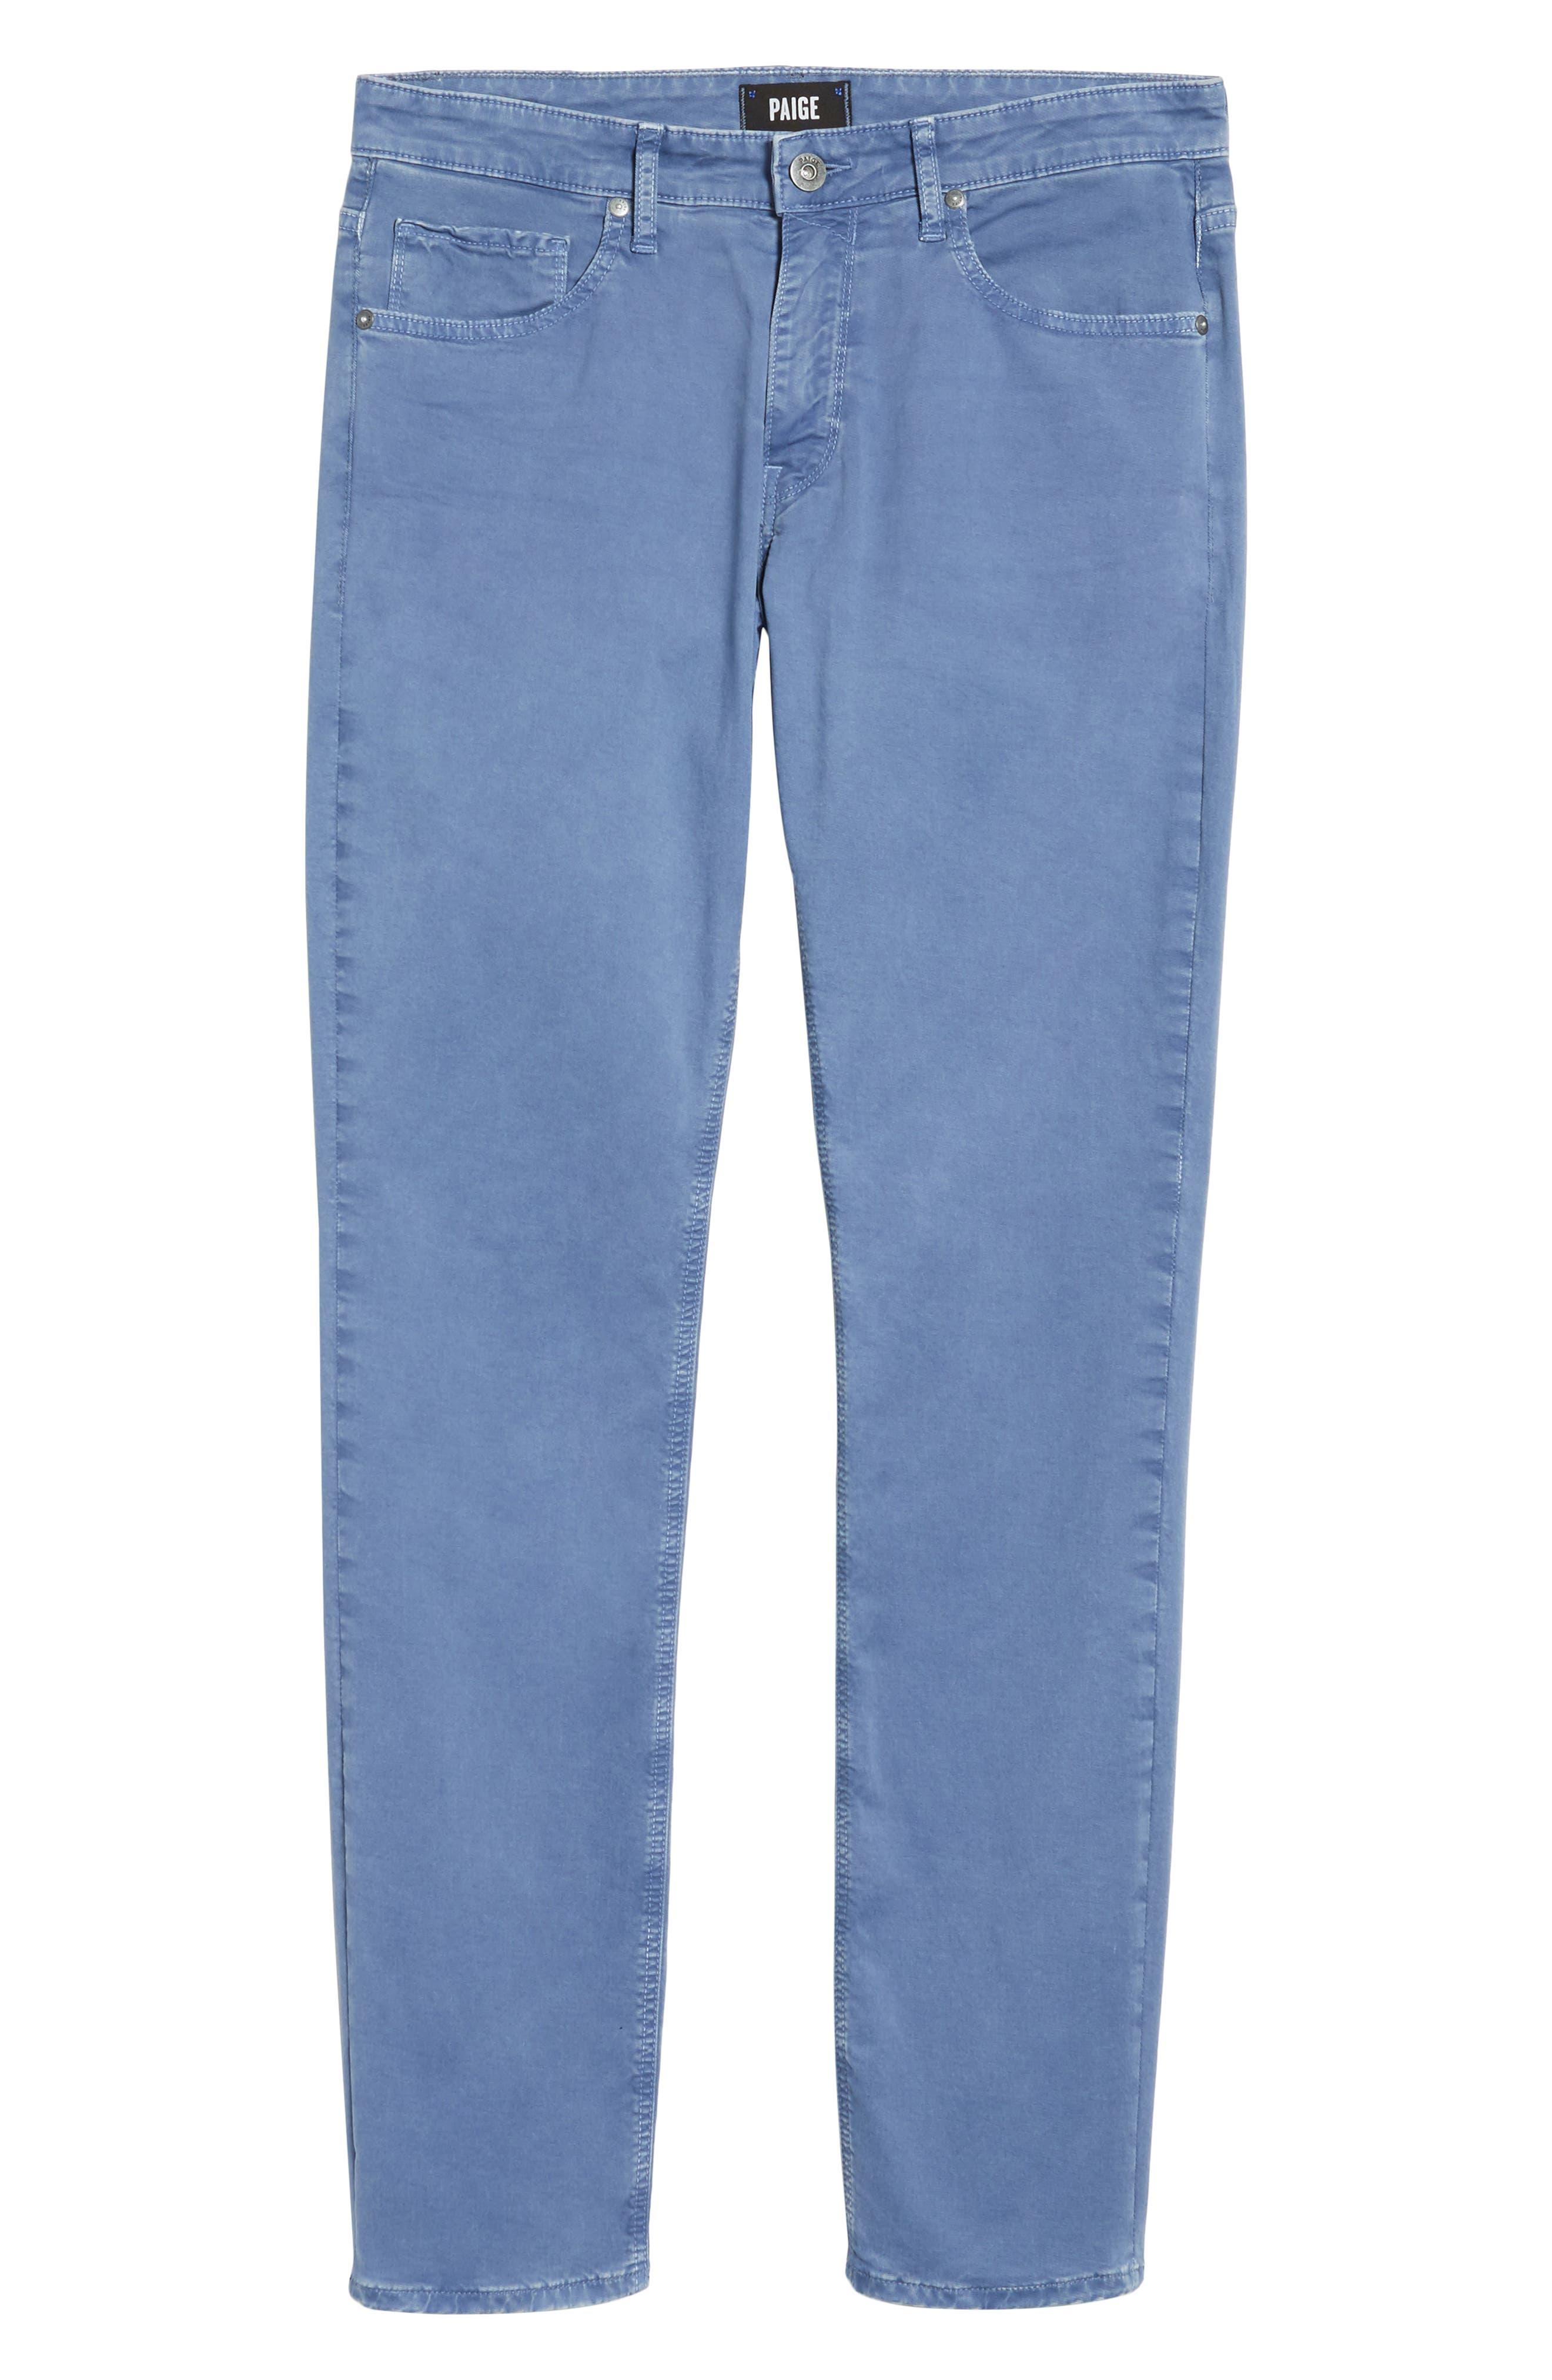 Lennox Slim Fit Five-Pocket Pants,                             Alternate thumbnail 6, color,                             Vintage Mariner